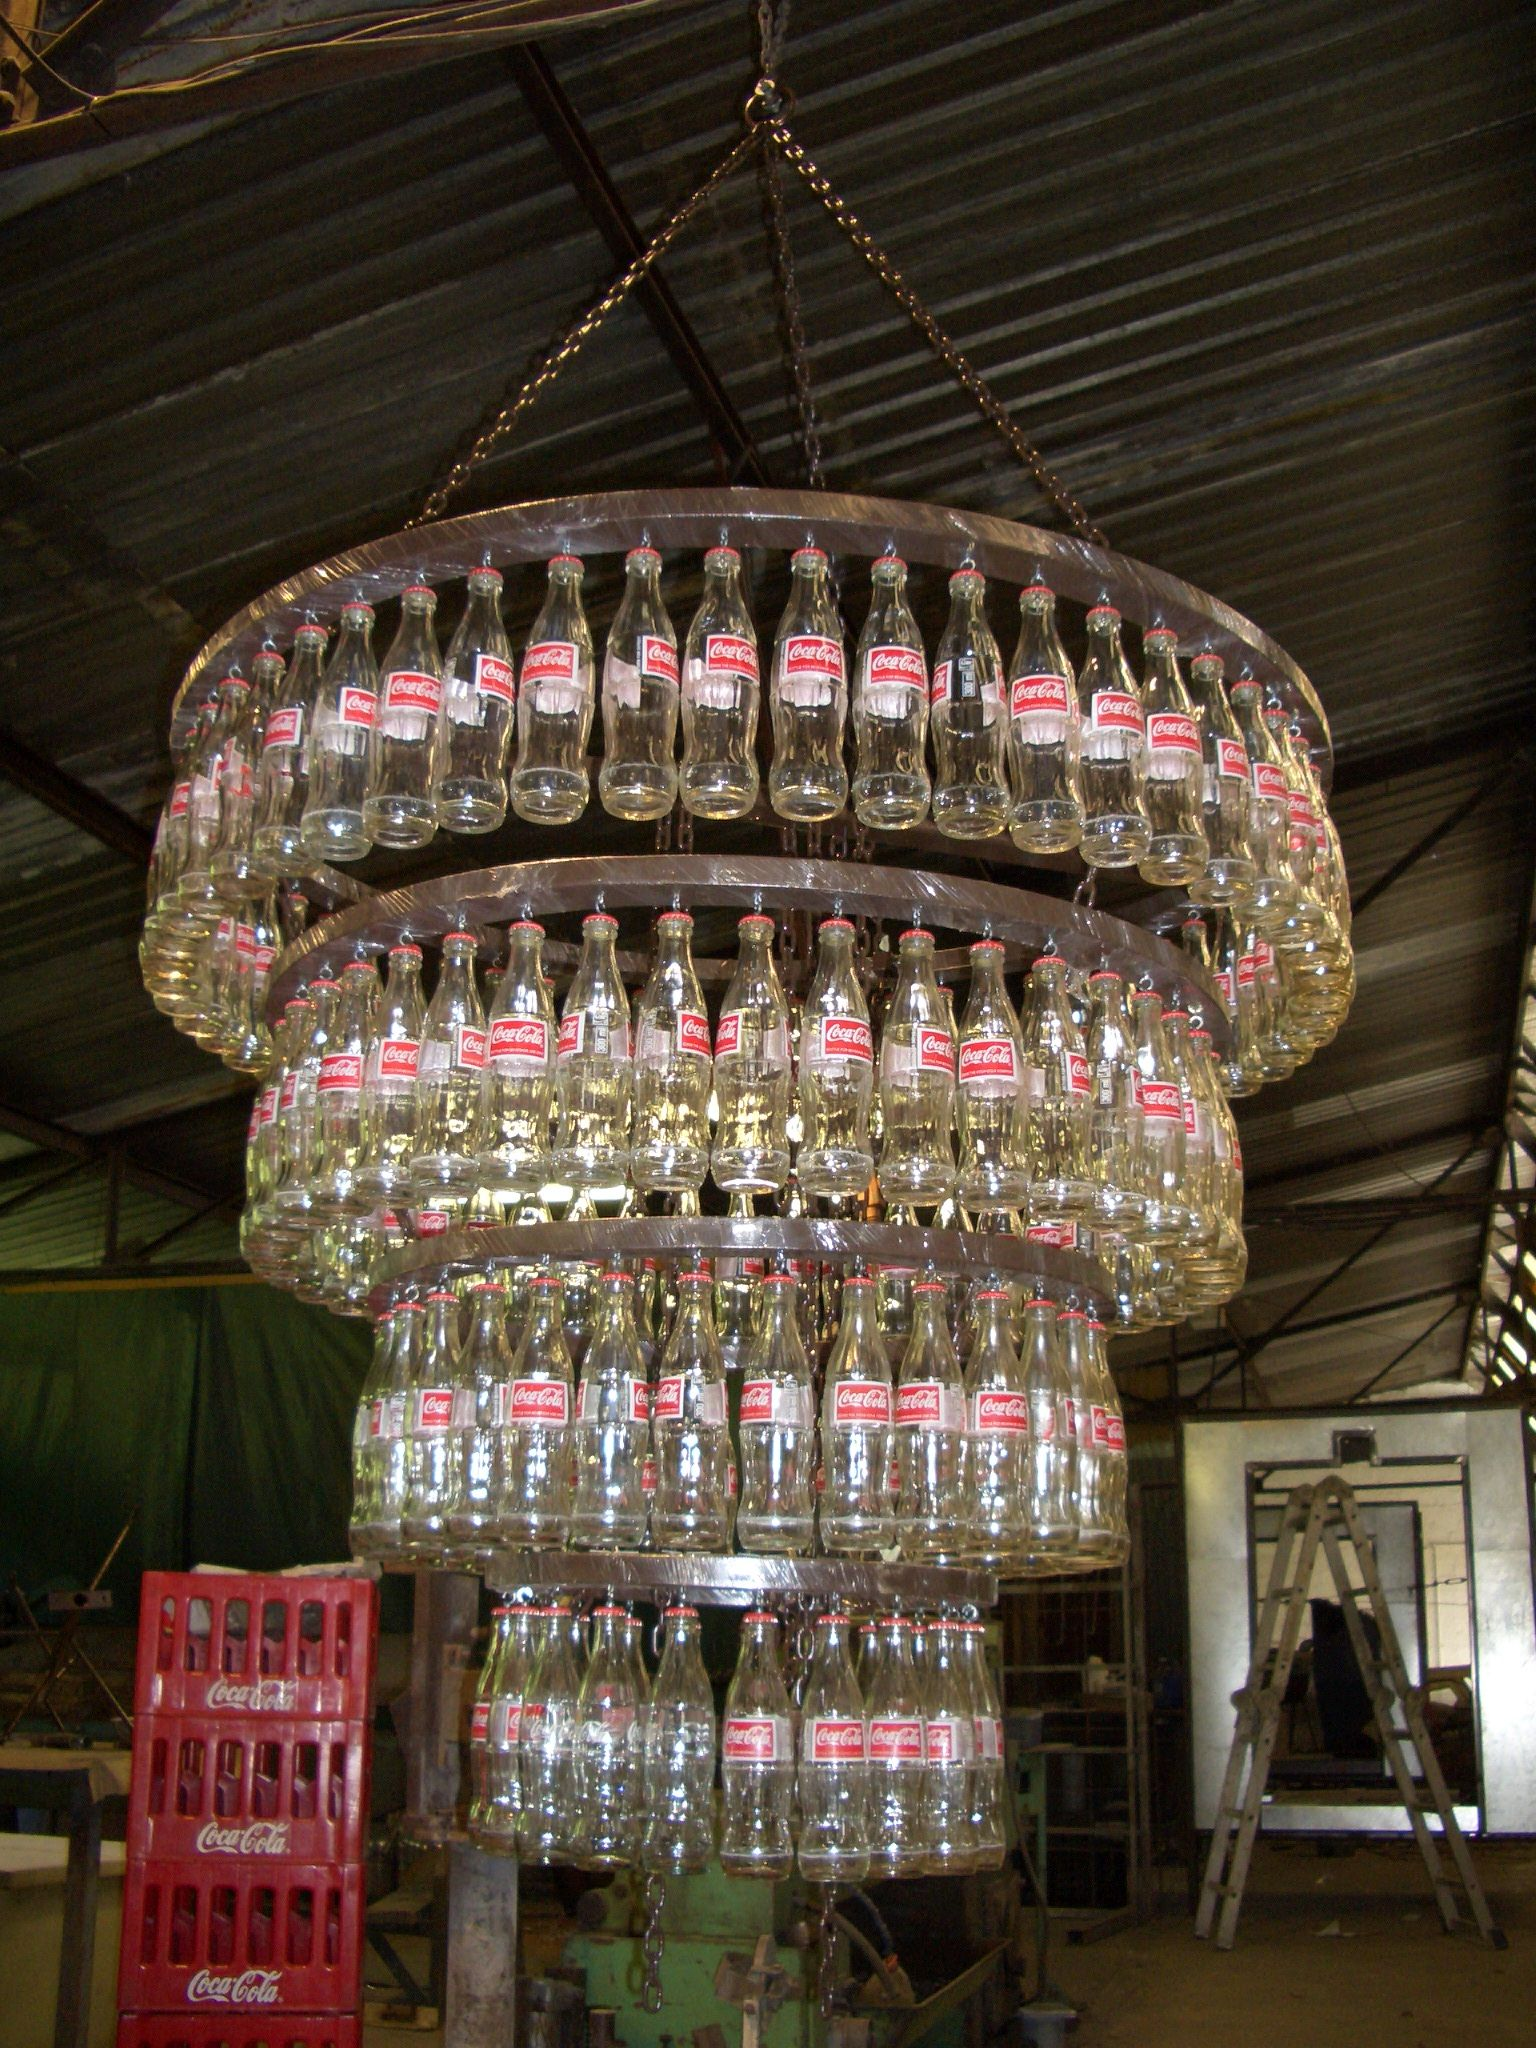 Cocacola bottles chandelier coke pepsi 7up just soda pop cocacola bottles chandelier arubaitofo Images